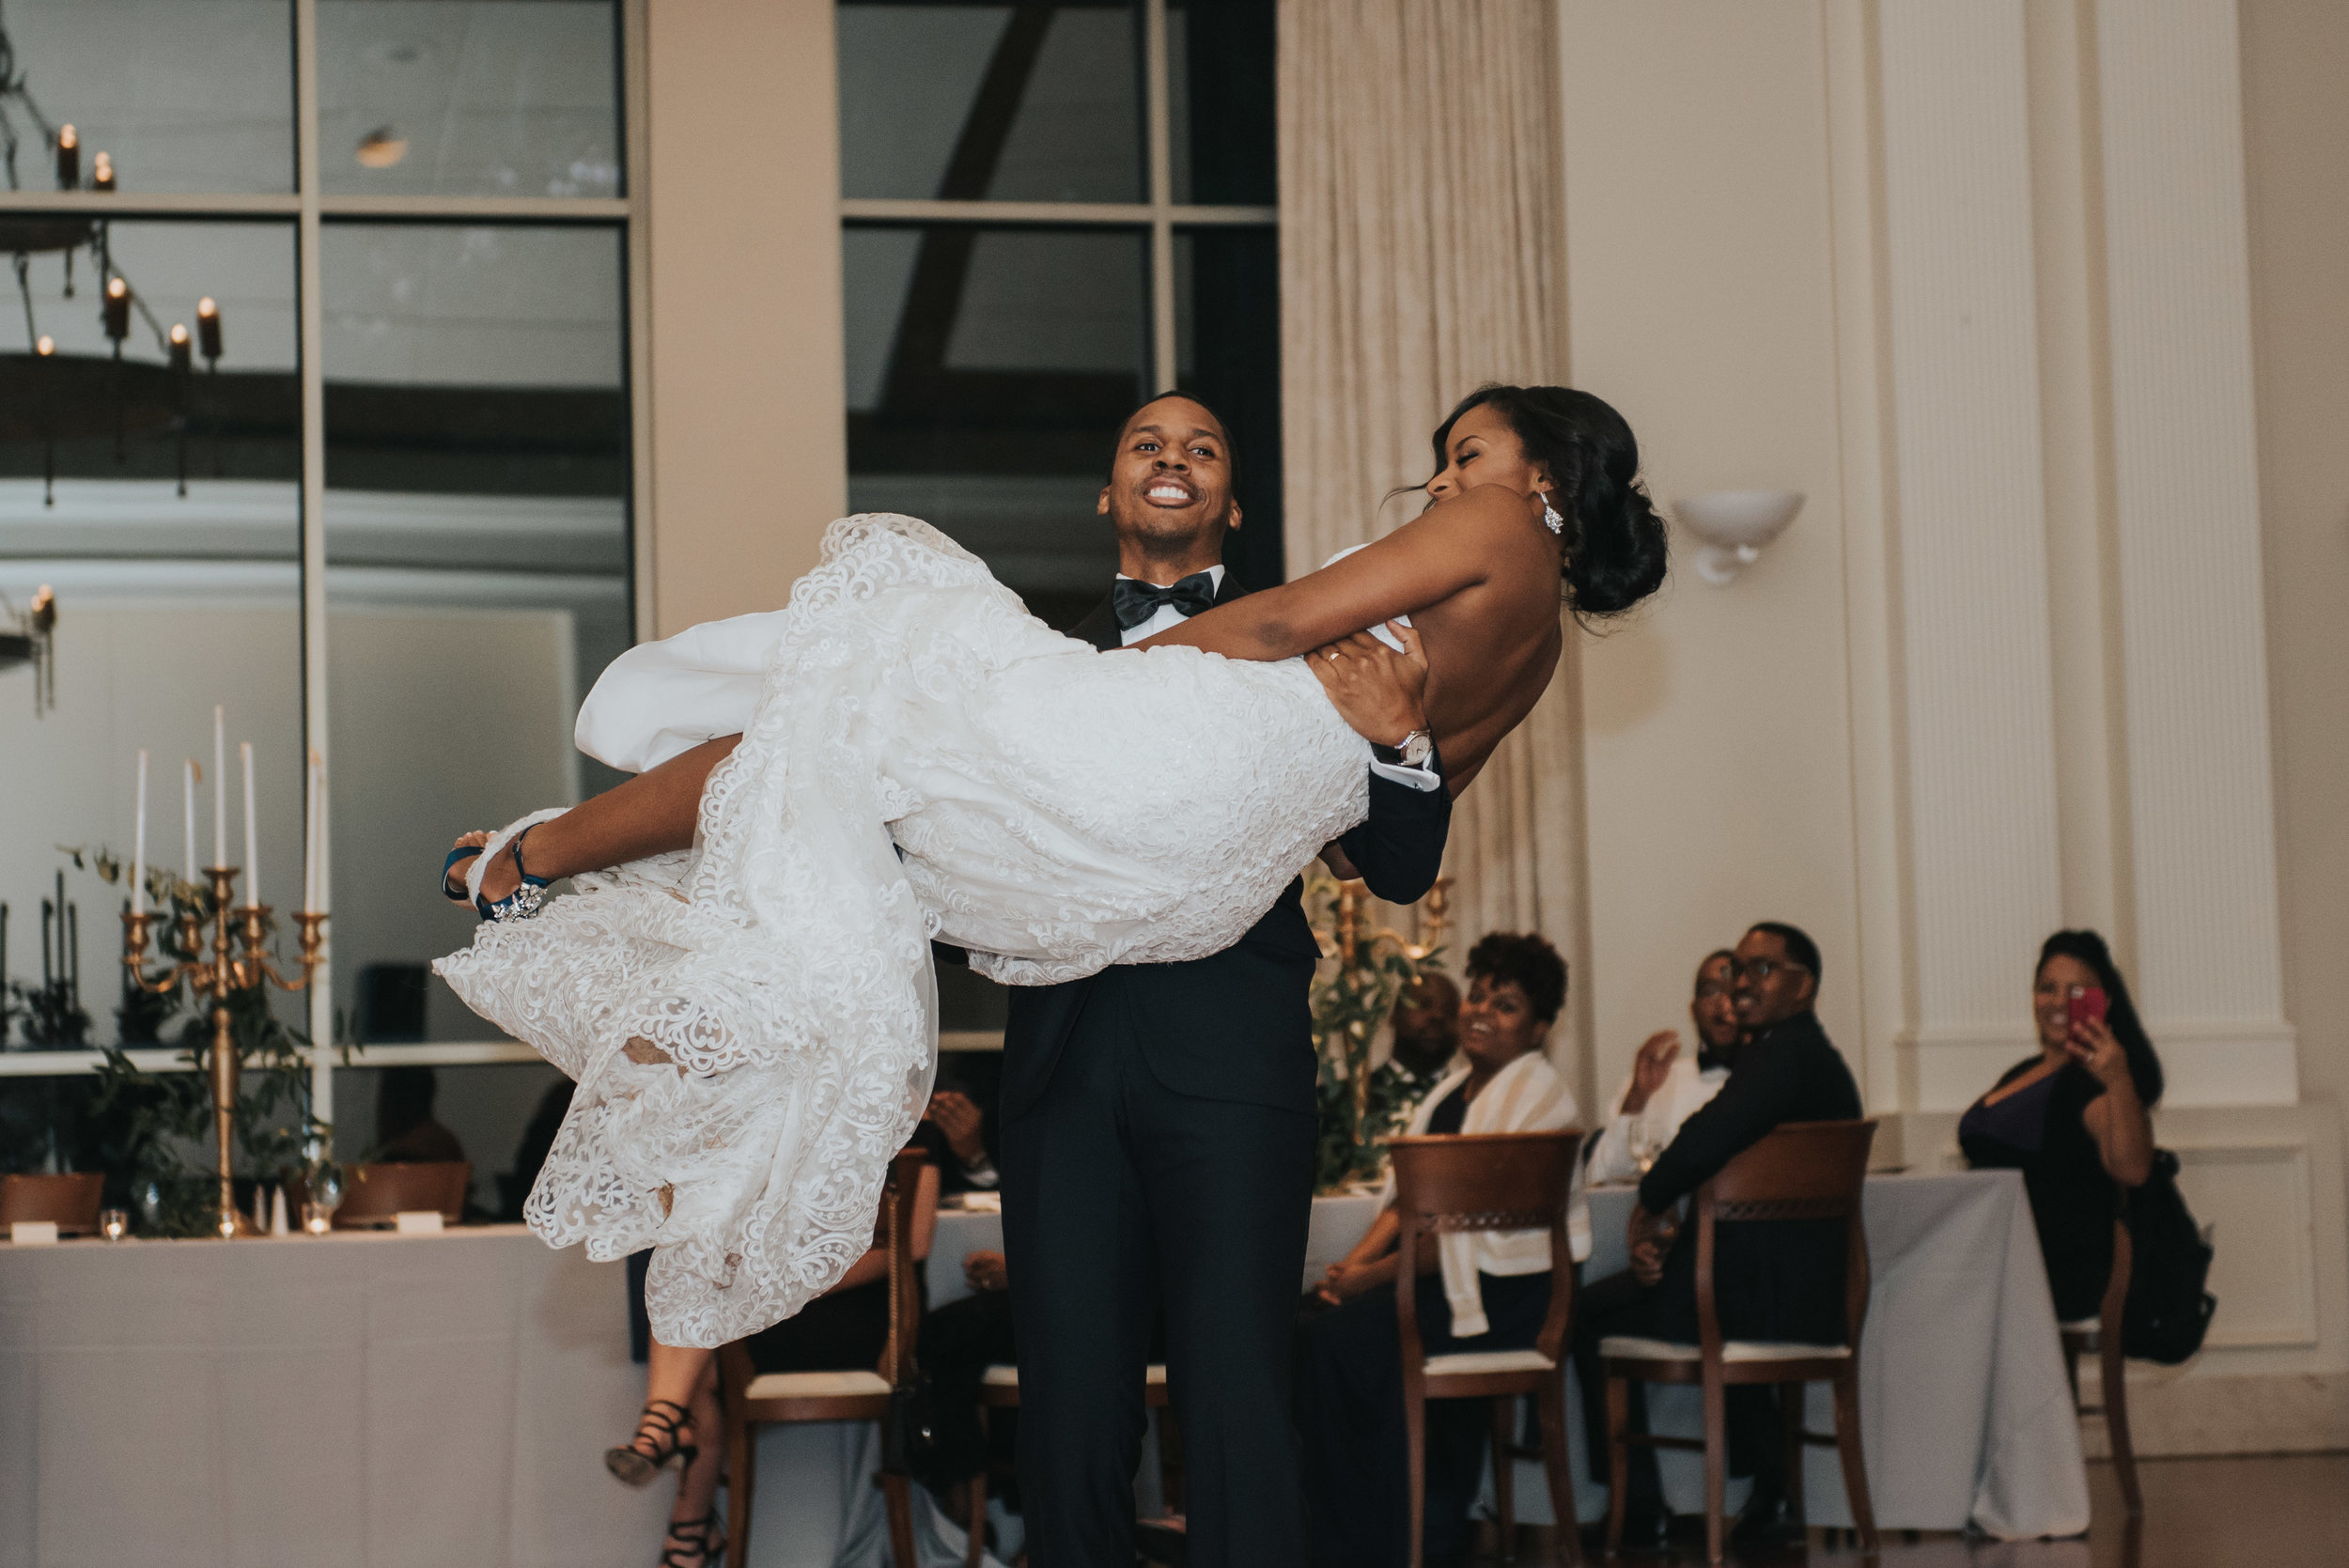 Groom carrying bride at wedding reception